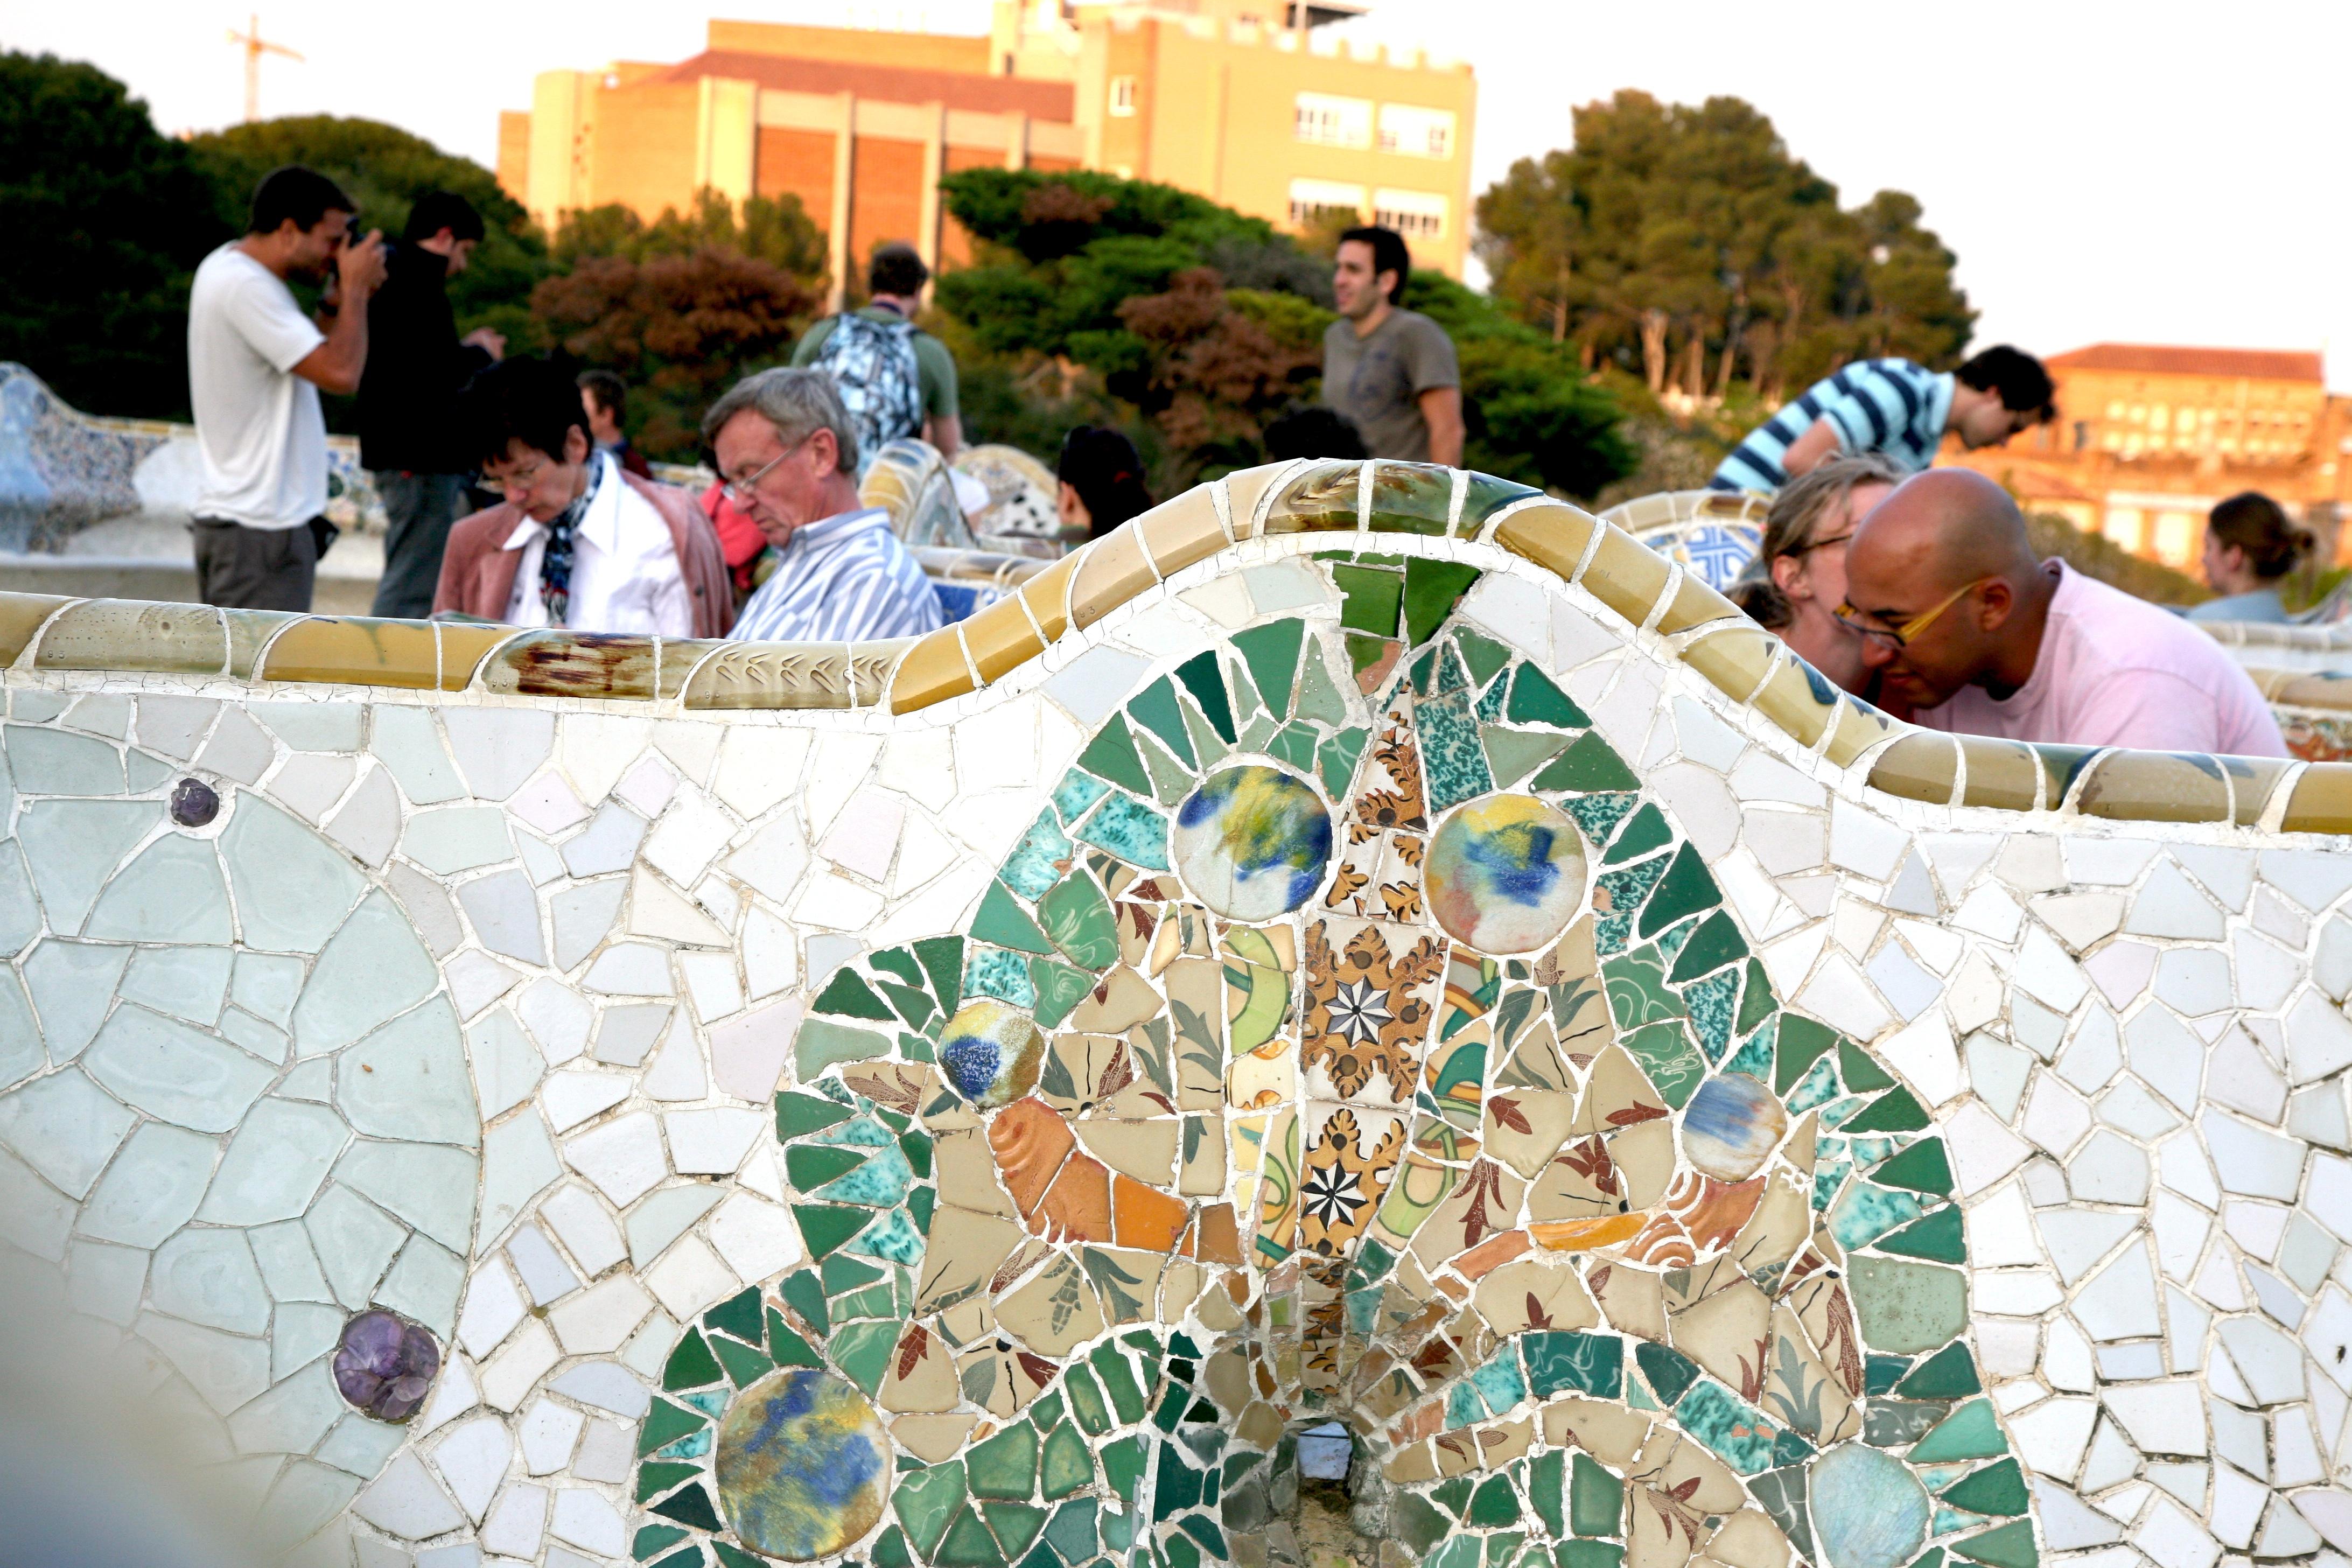 Fotos gratis arquitectura banco parque jard n for Barcelona jardin gaudi